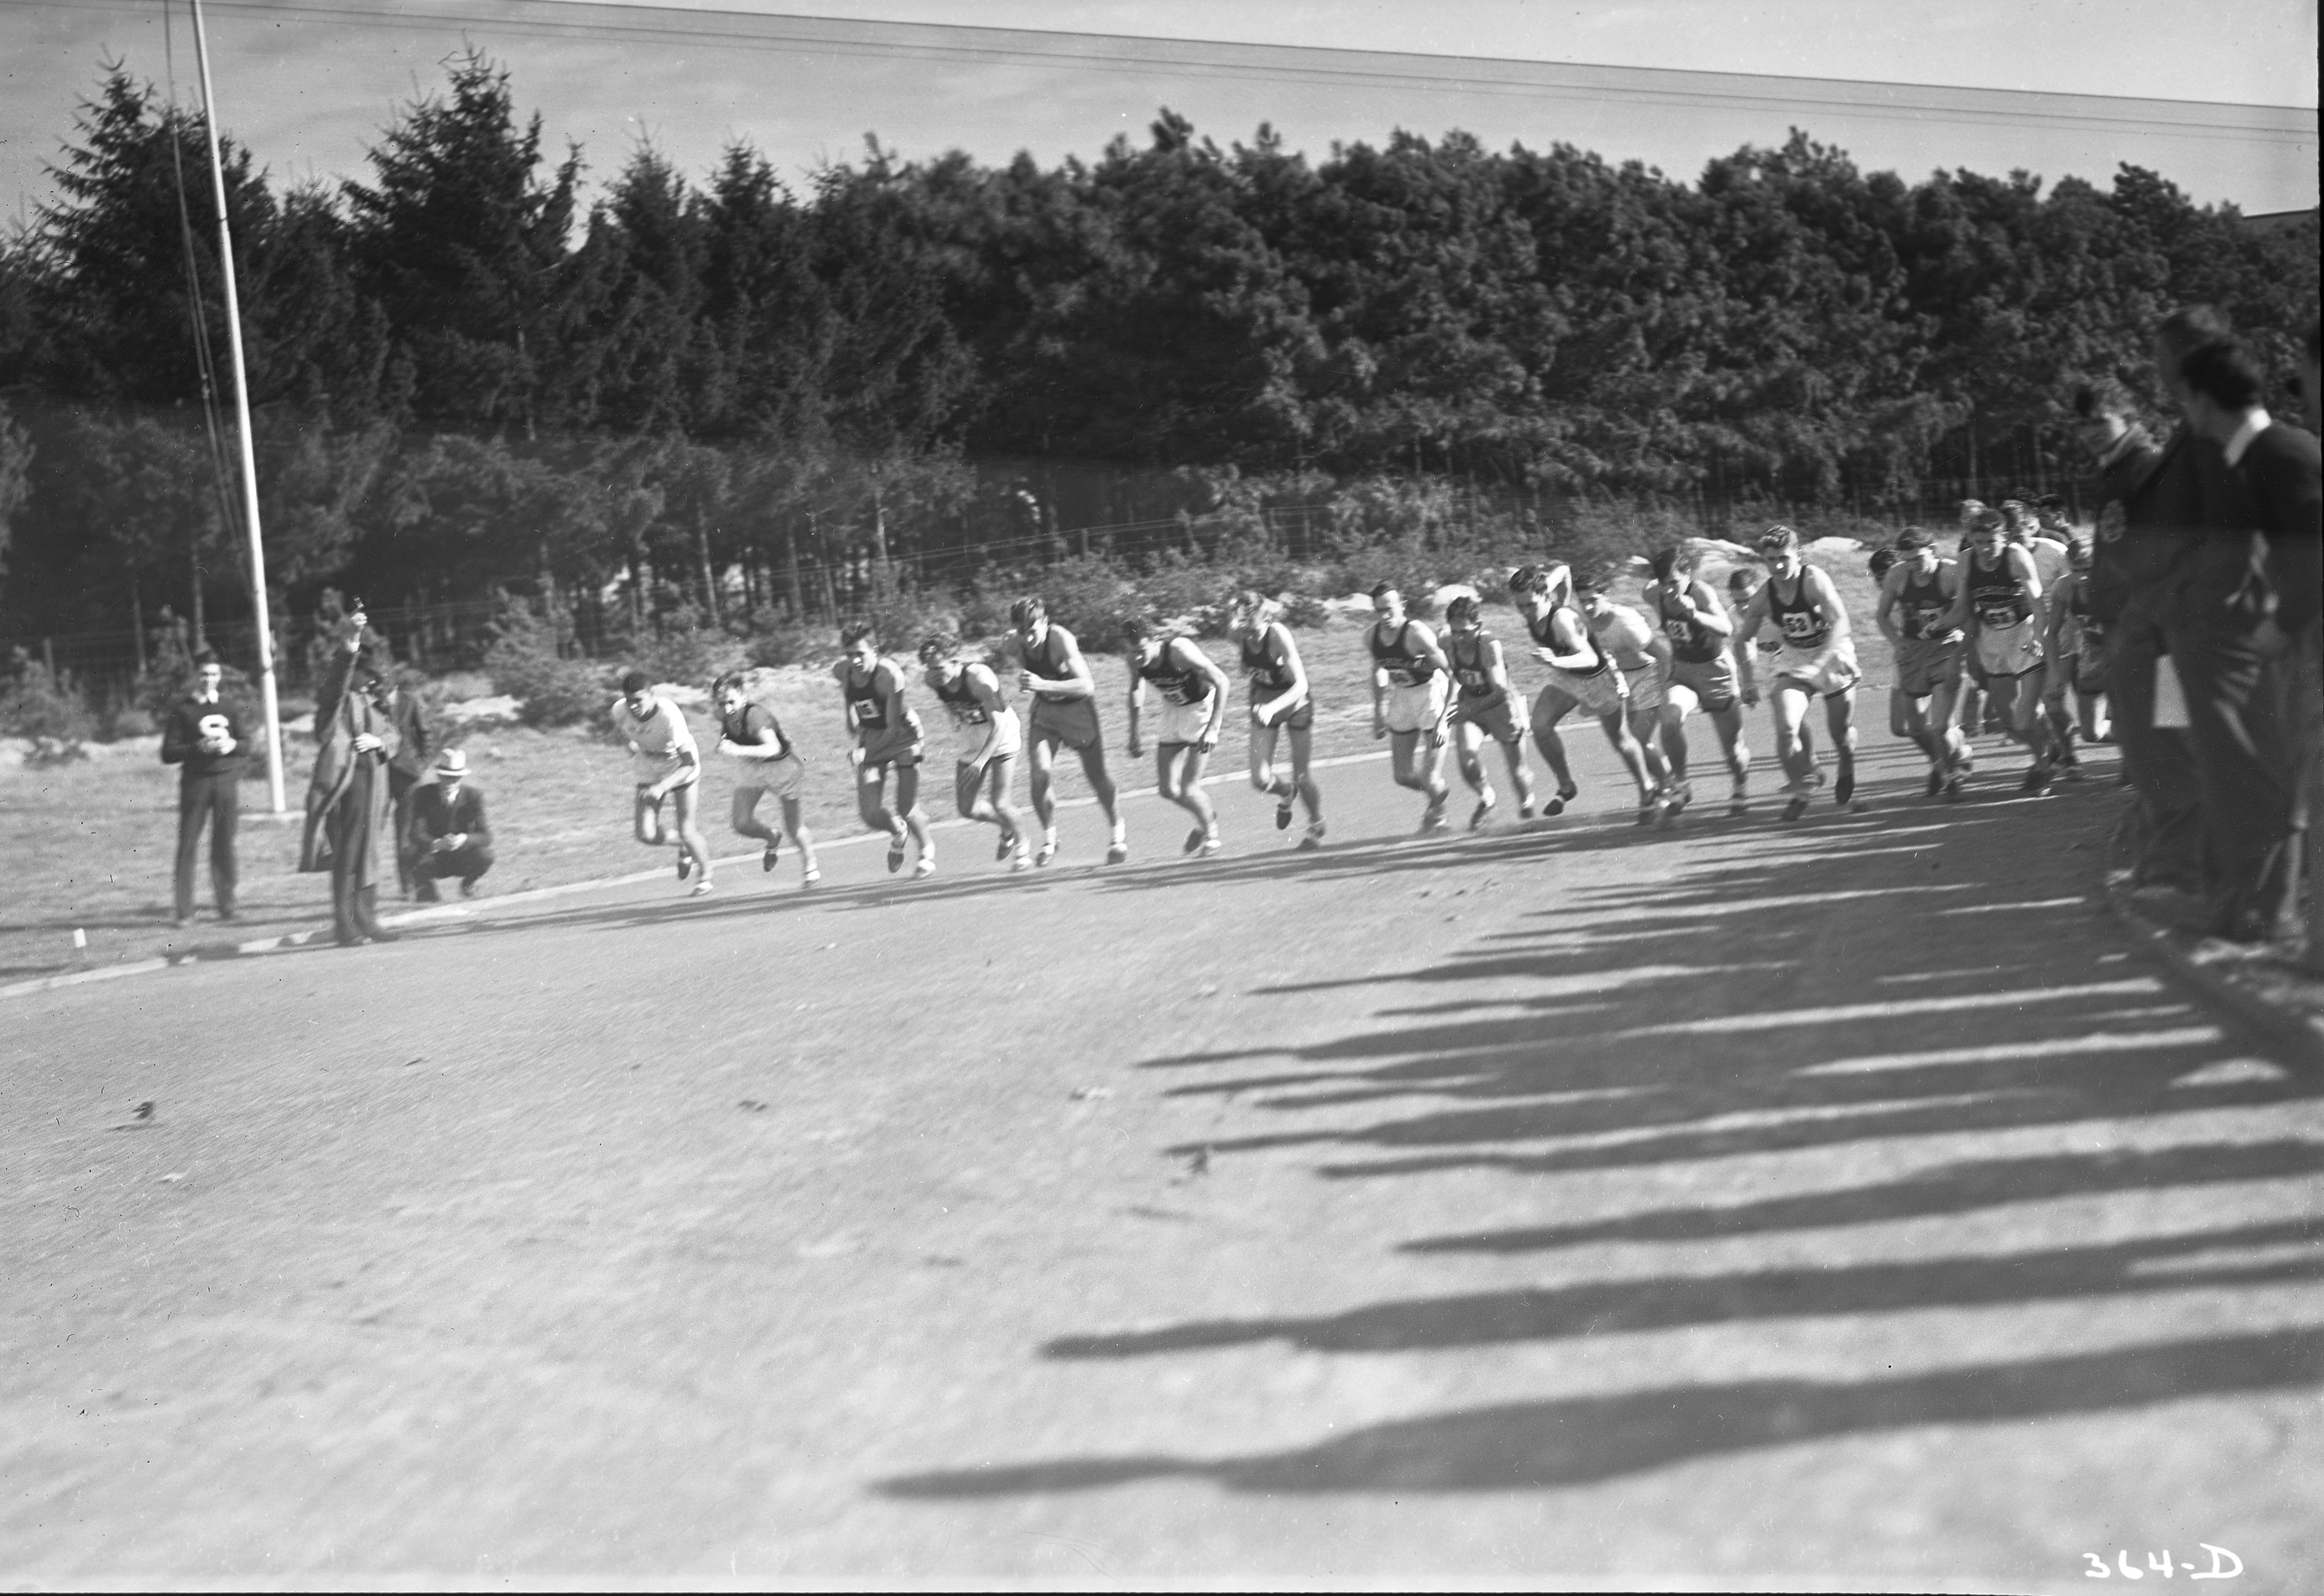 MSC Cross Country Team, 1938